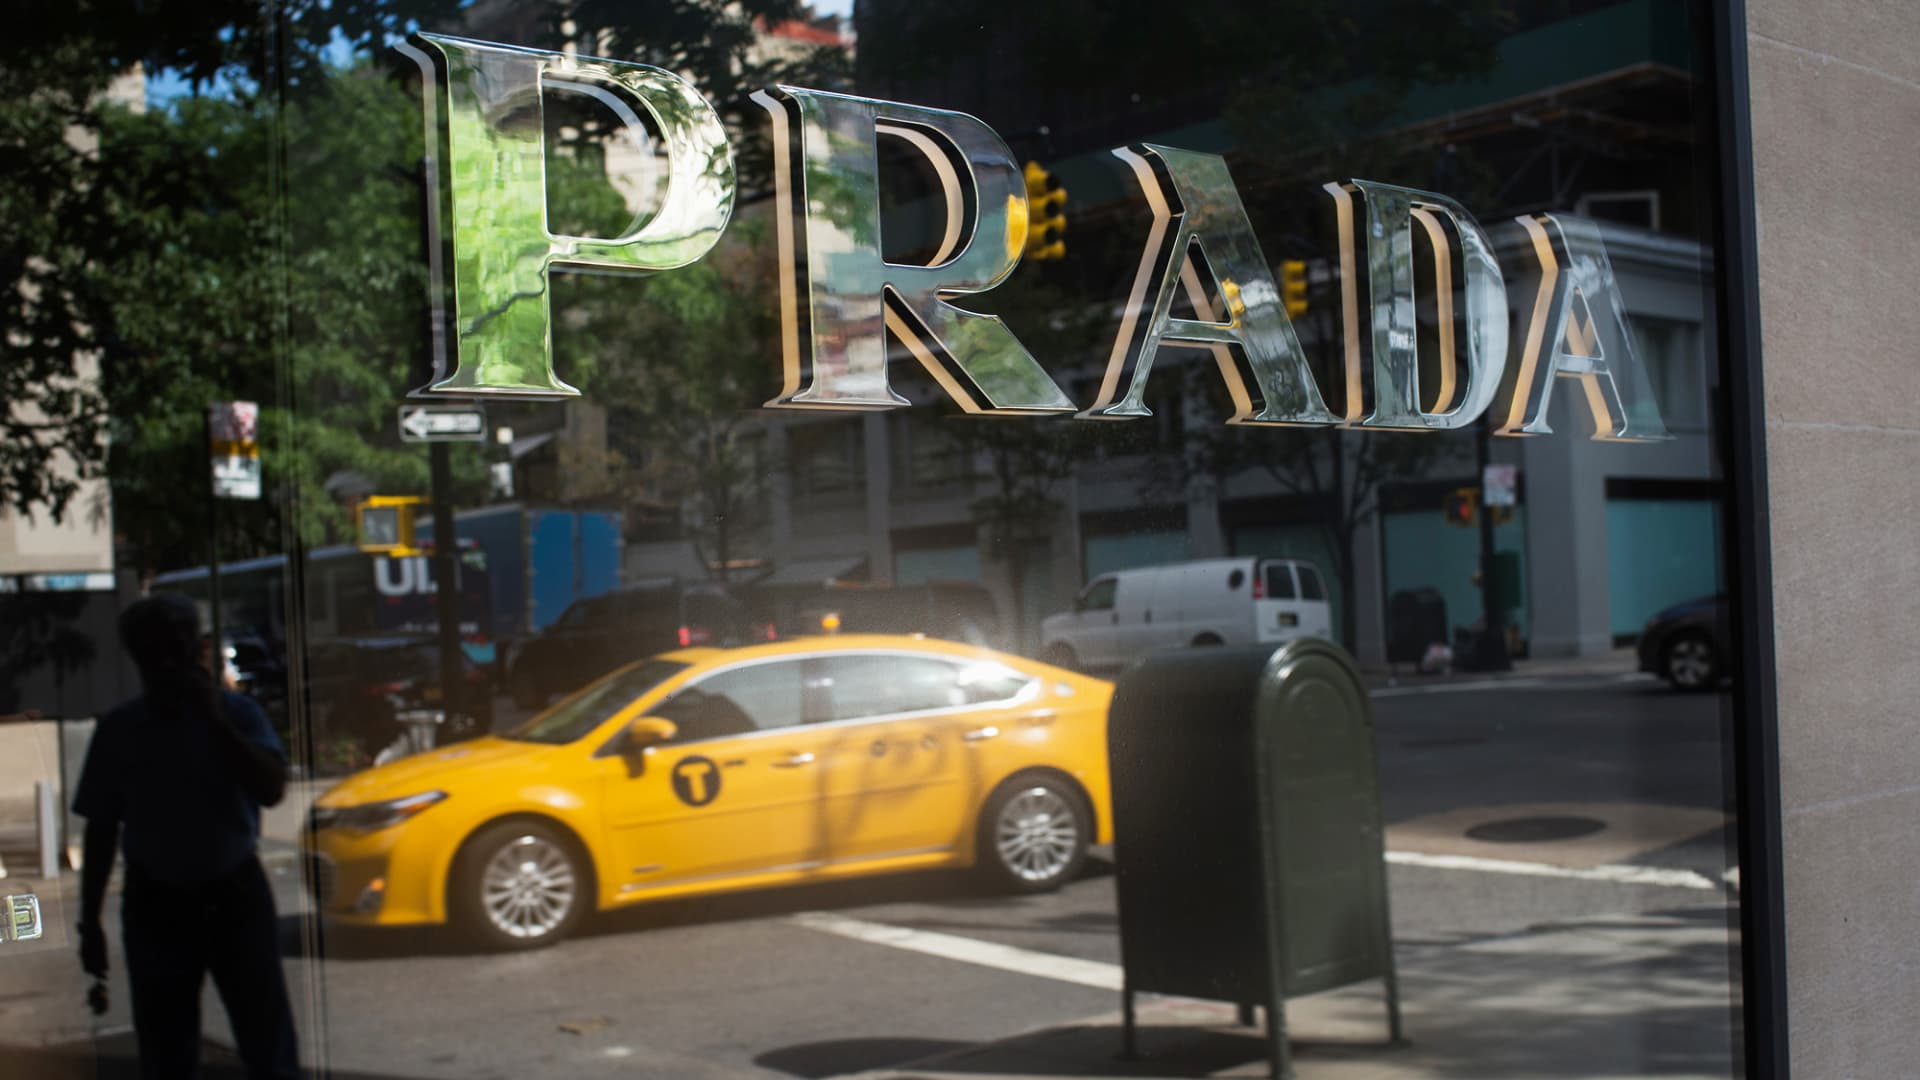 A Prada store in New York.